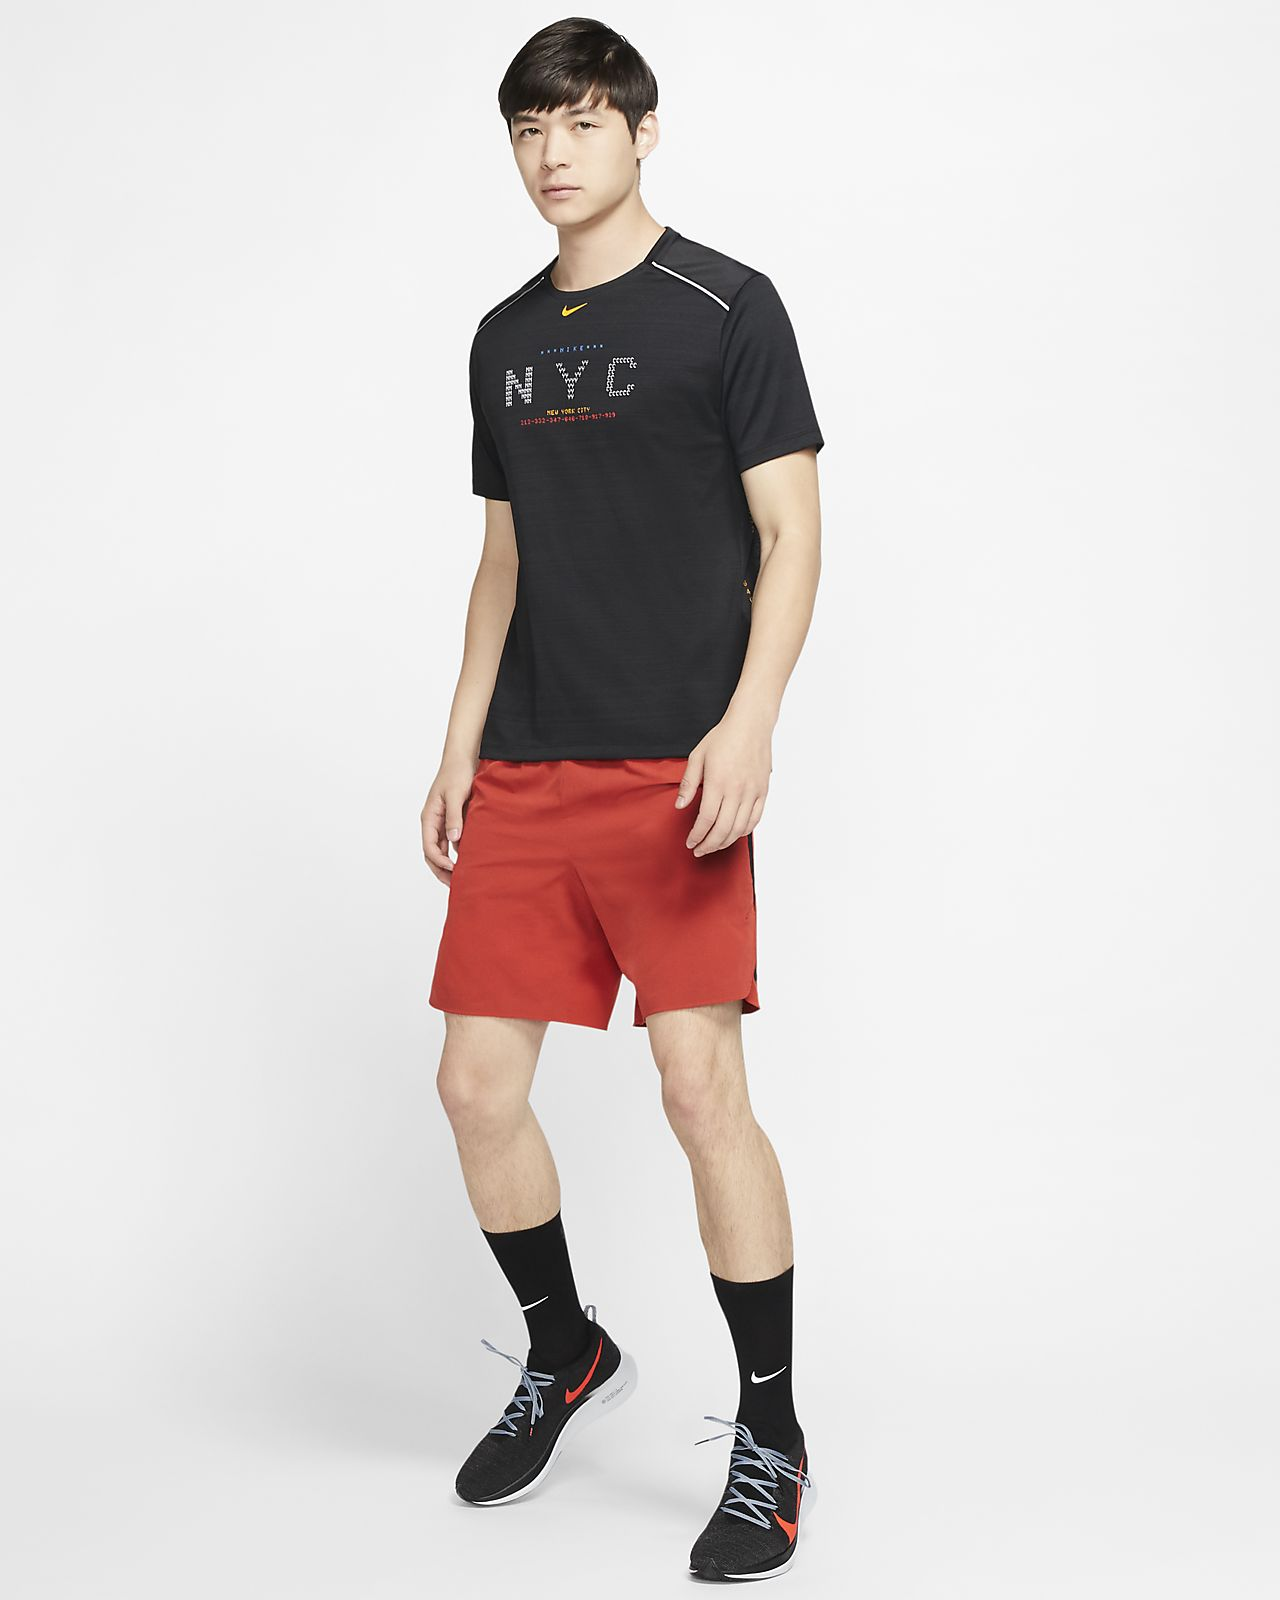 Maglia da running a manica corta Nike Dri-FIT Miler NYC - Uomo